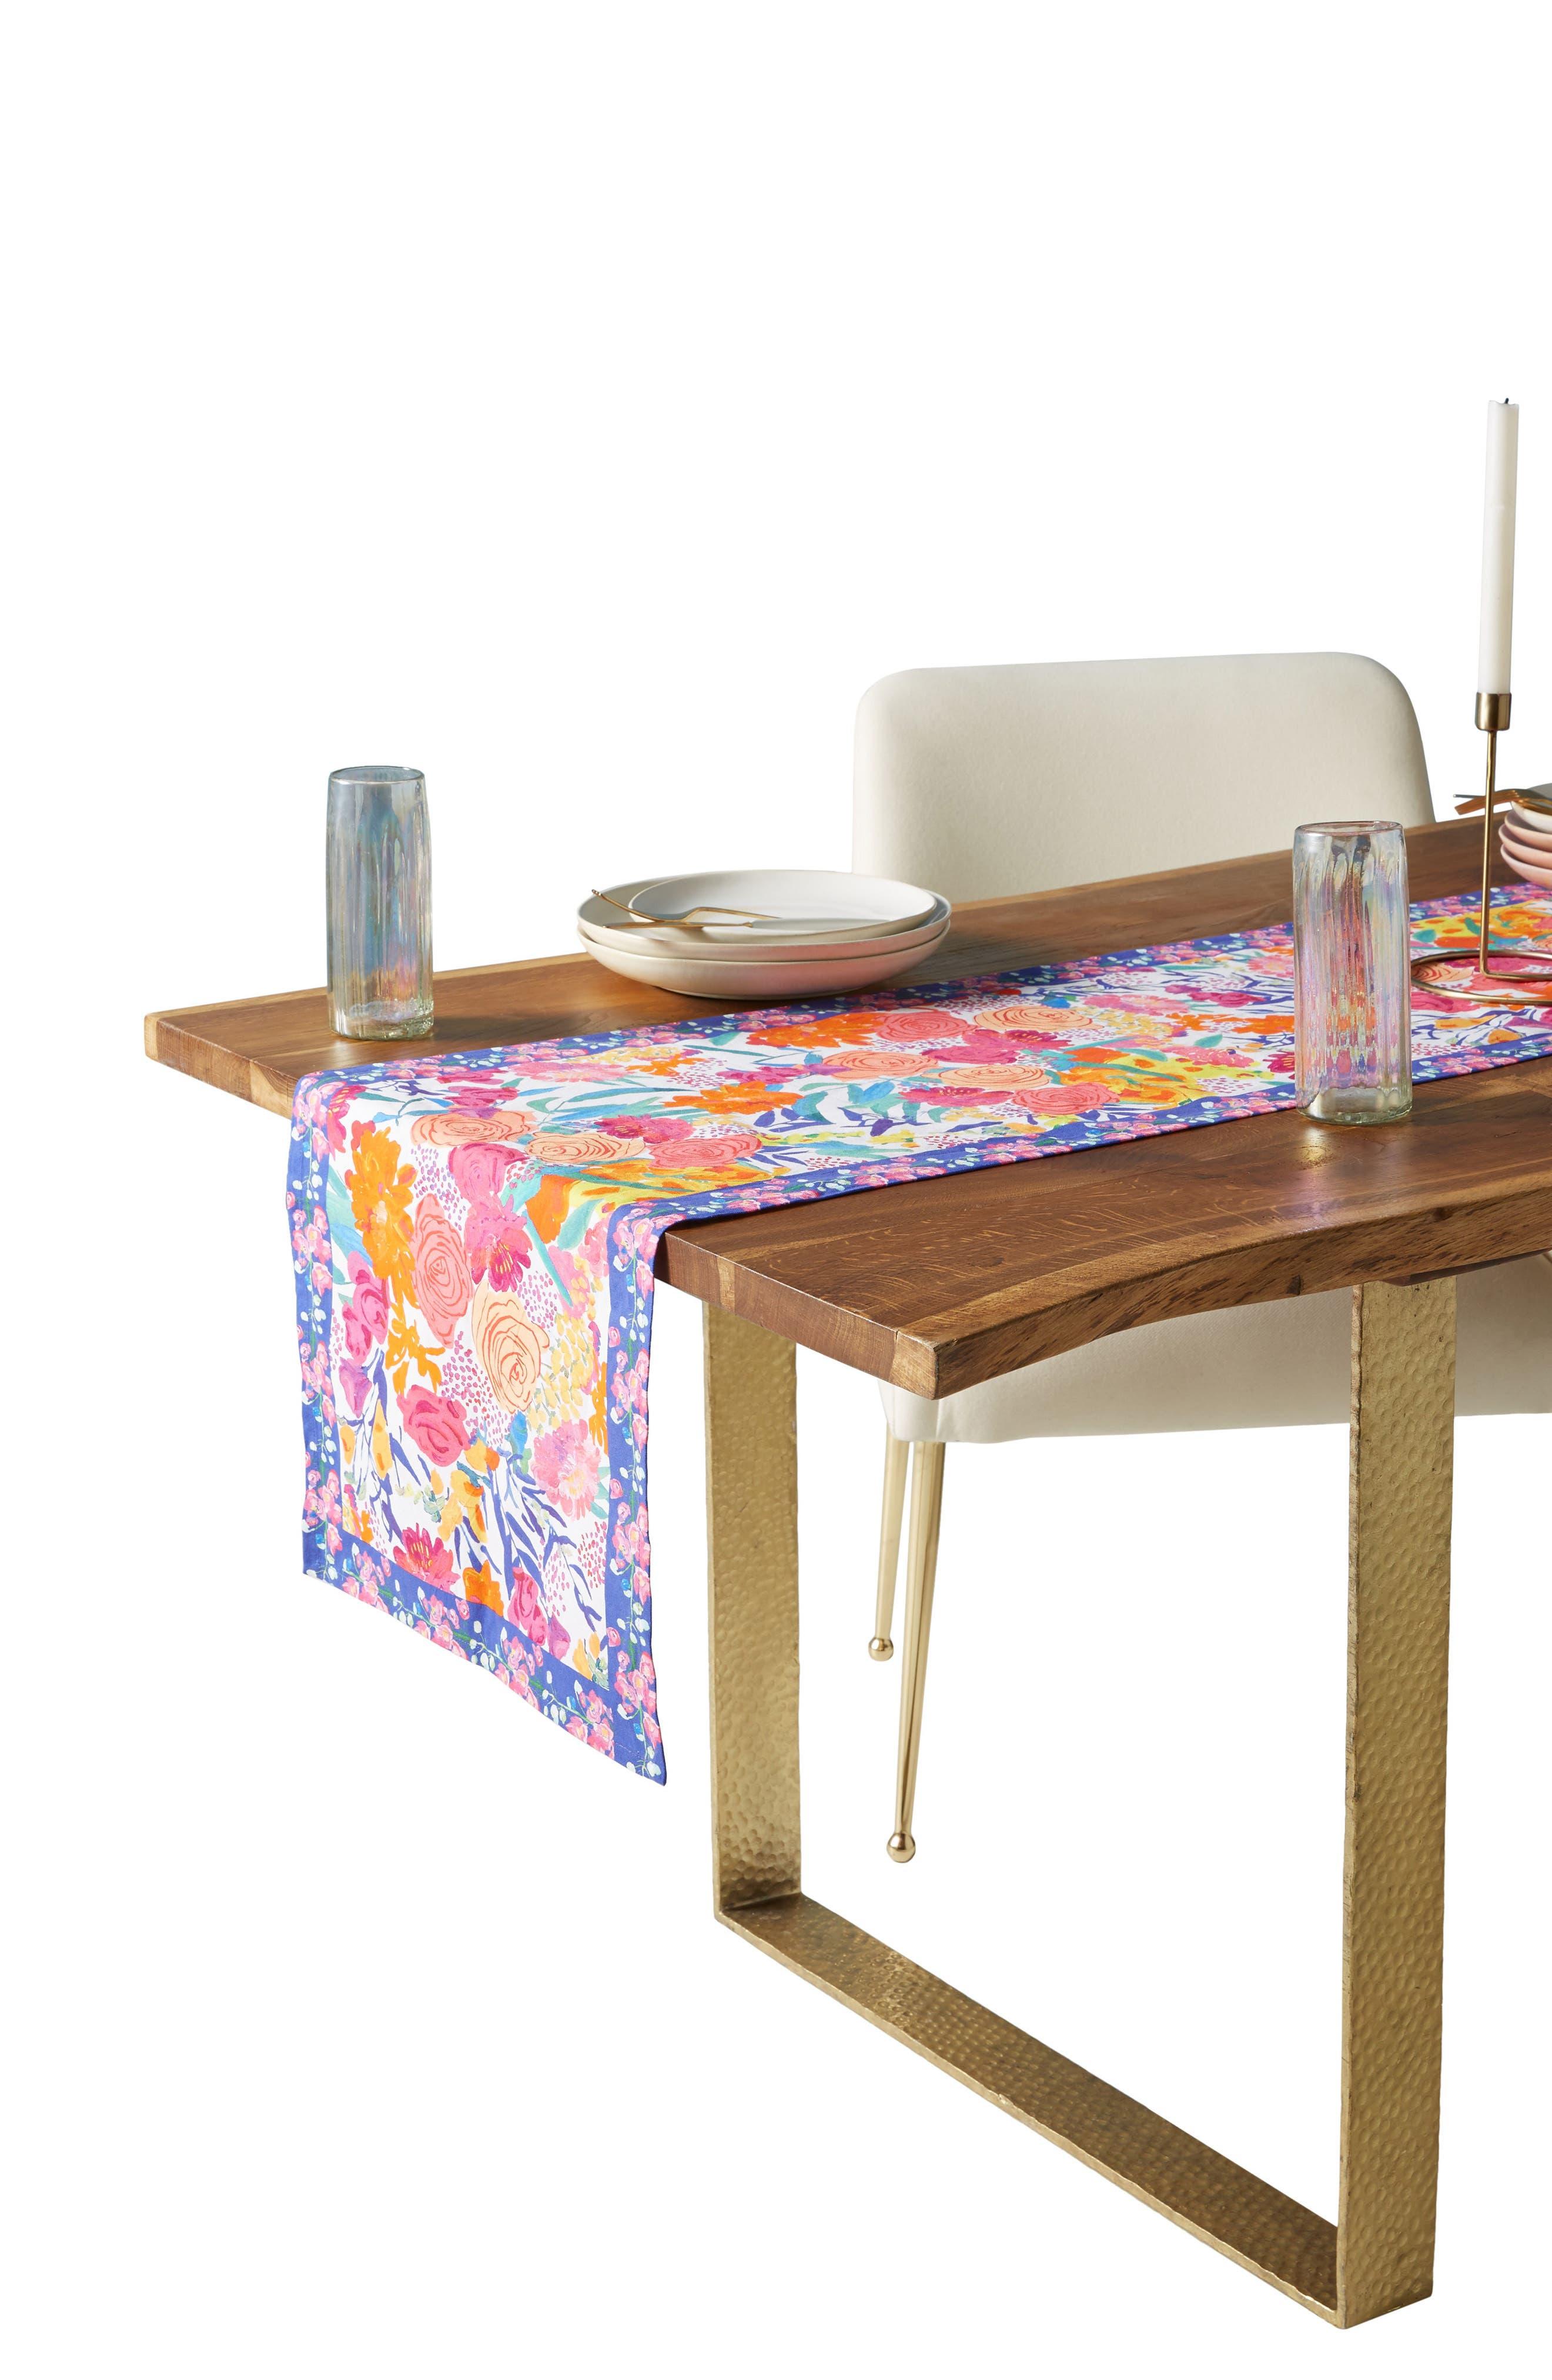 Paint + Petals Table Runner,                             Alternate thumbnail 3, color,                             White Multi